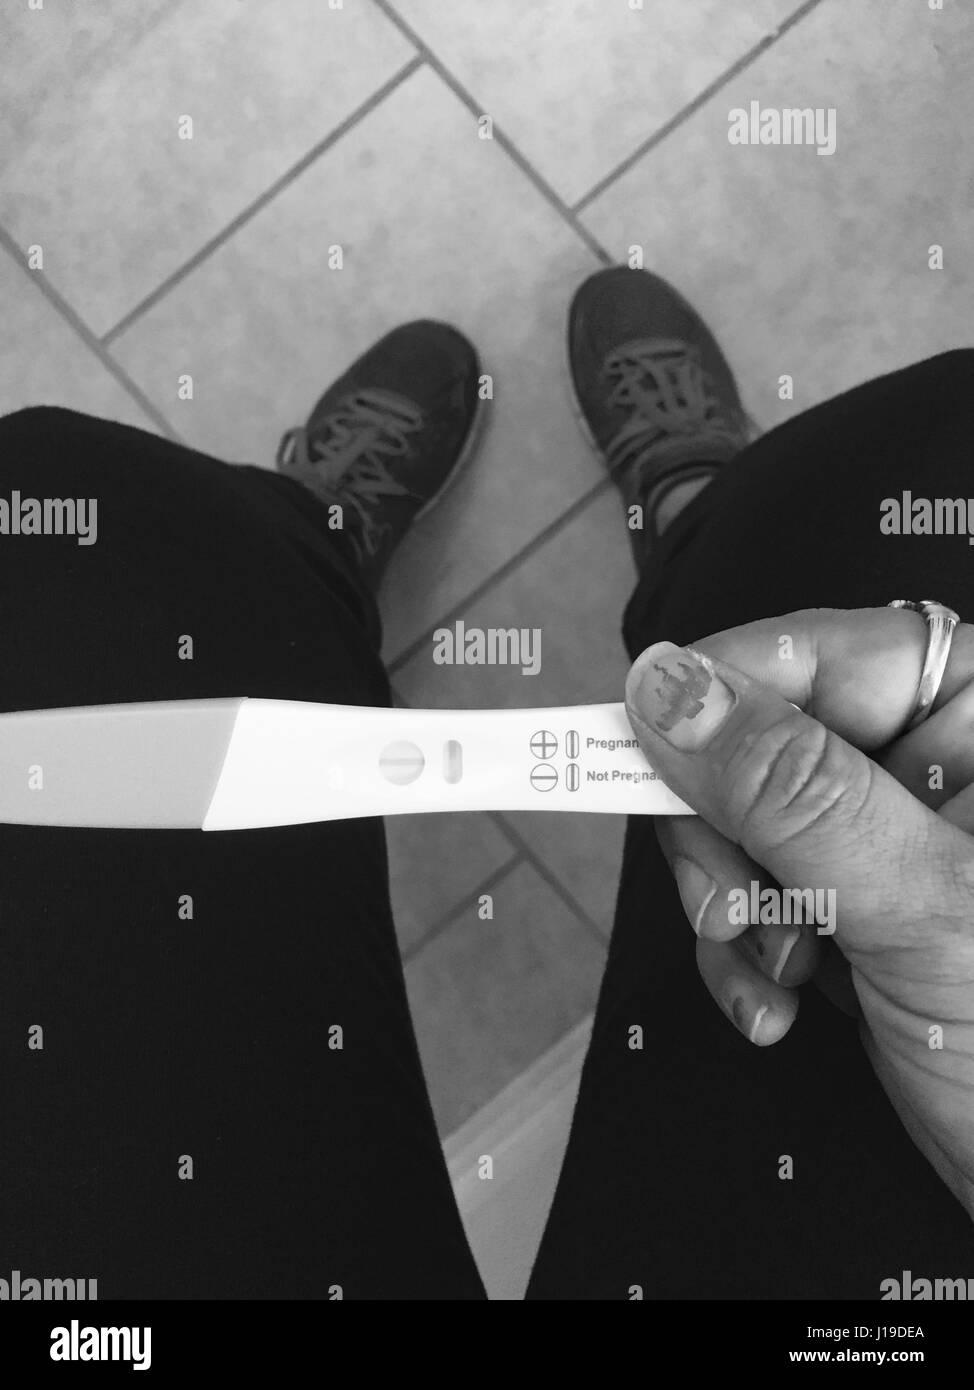 pregnancy test positive black hand